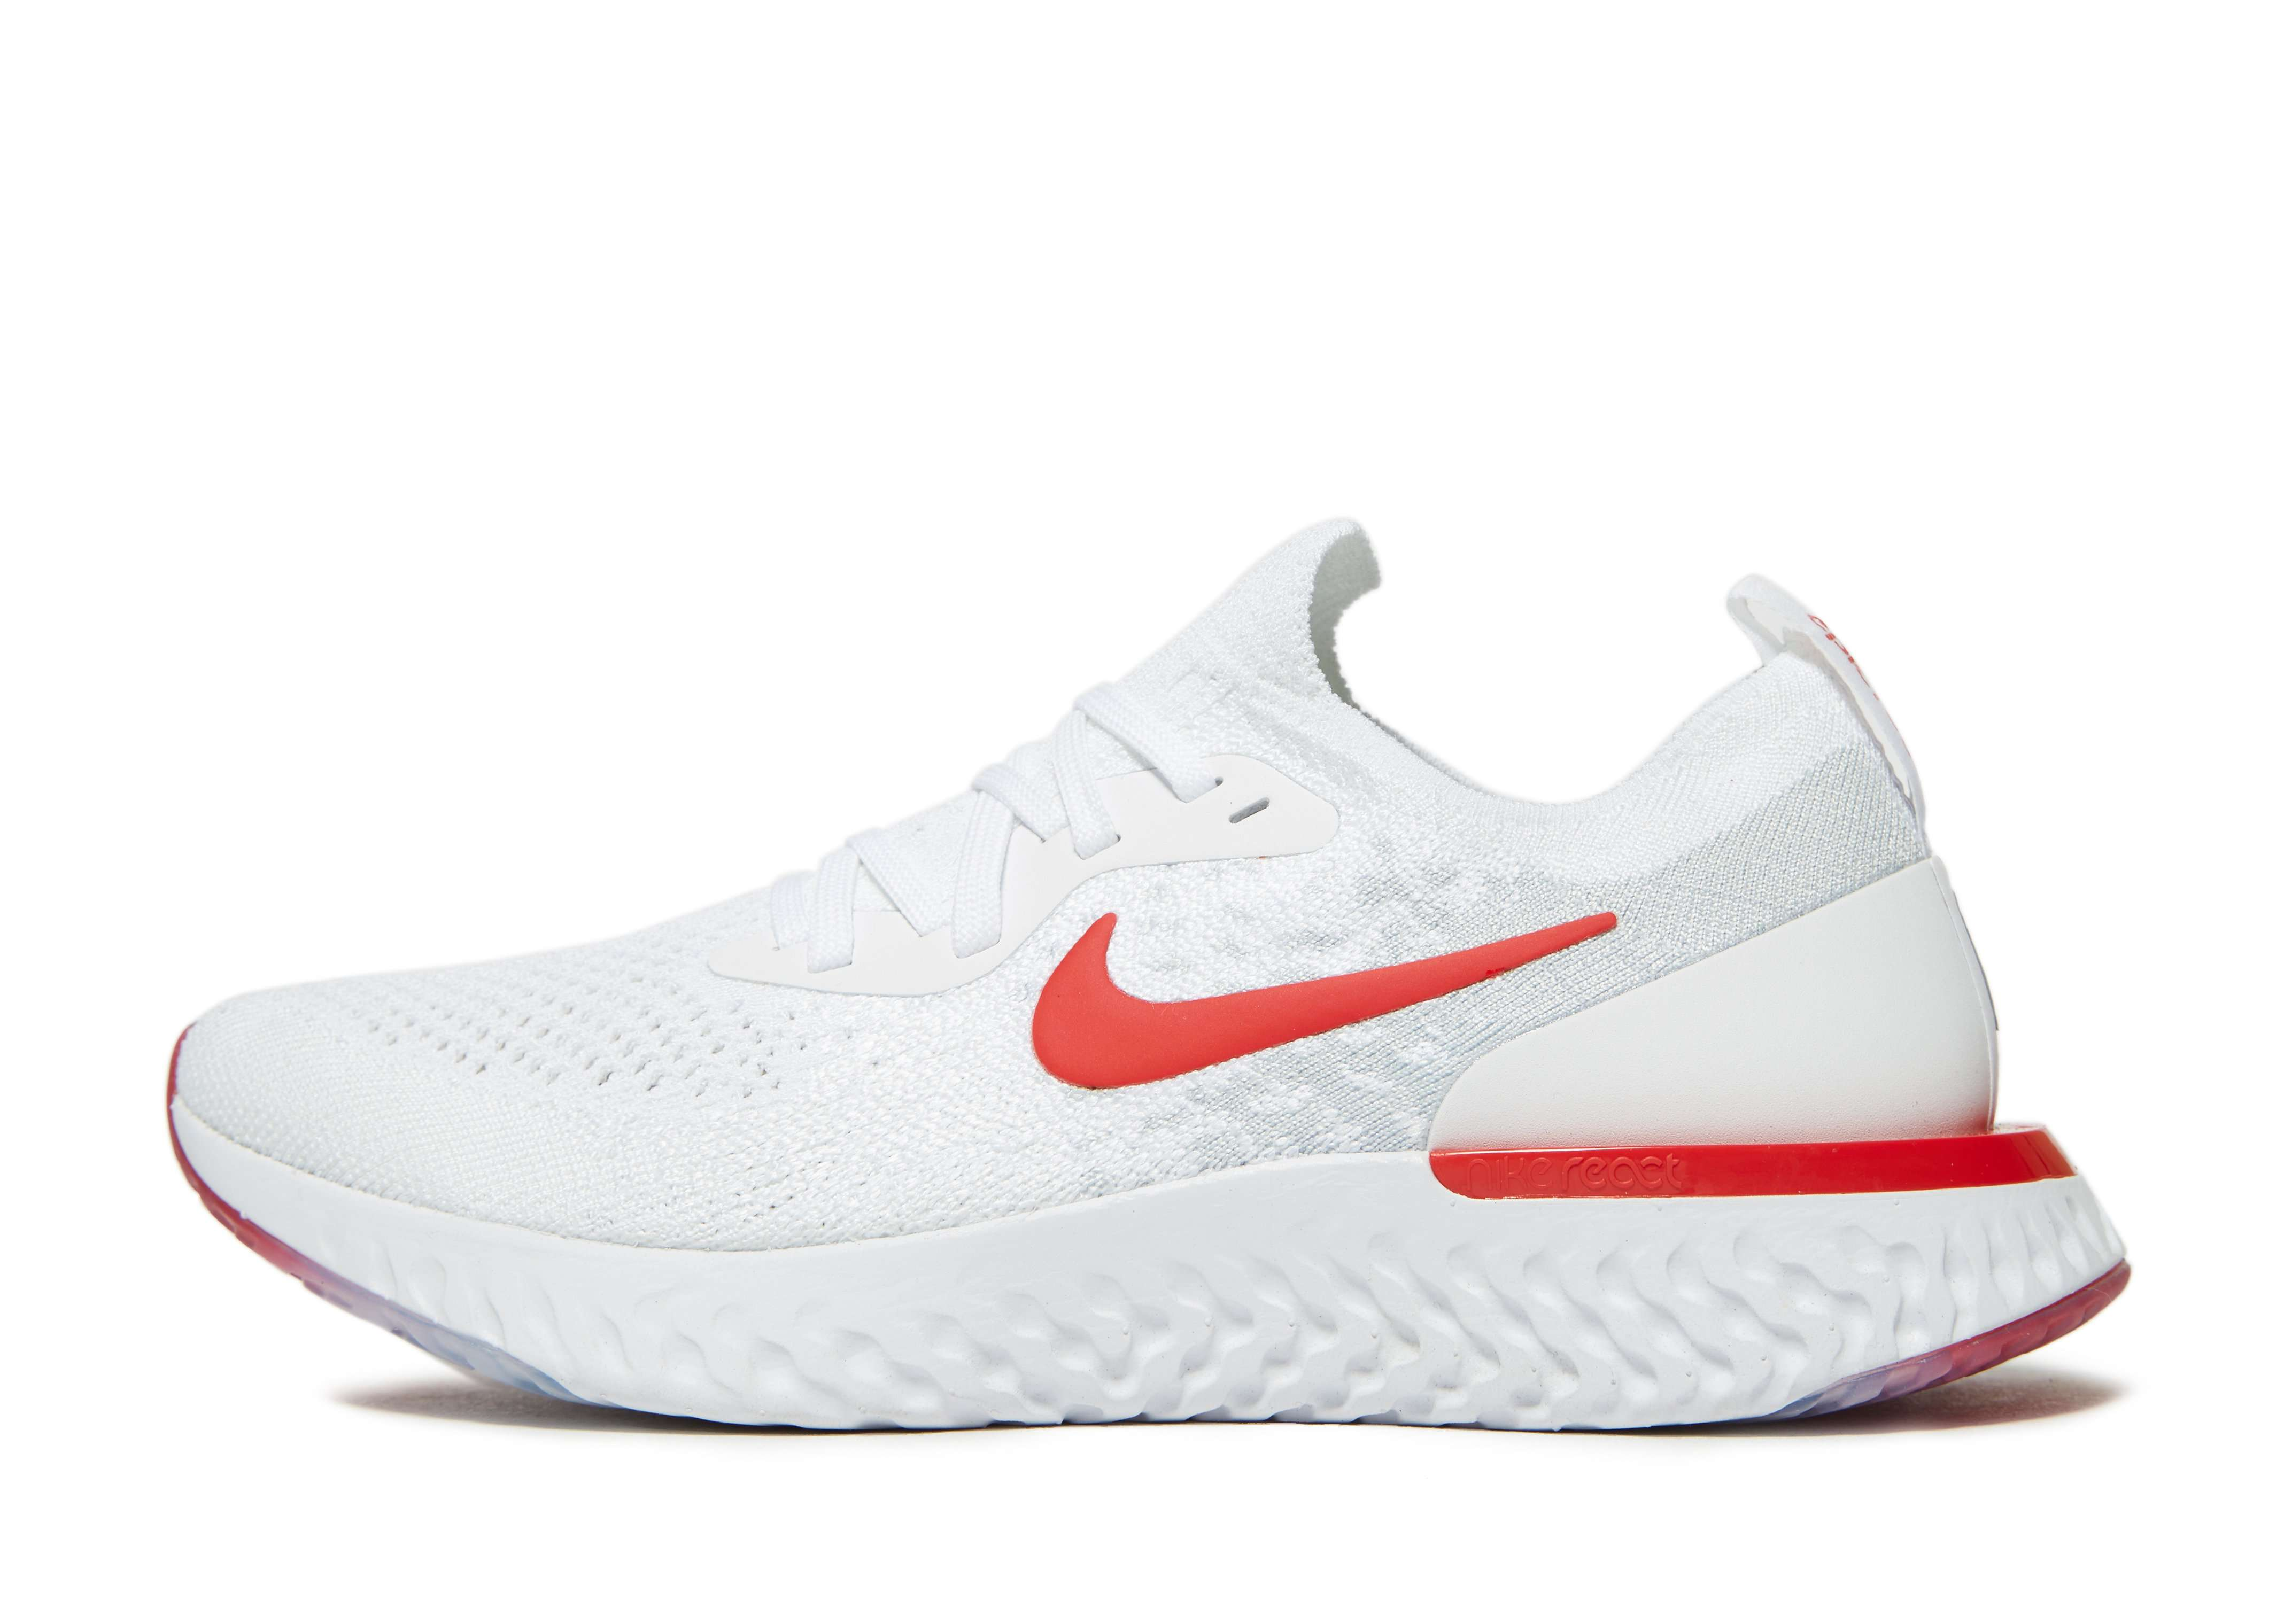 on sale 30d71 585bd Nike Epic React Flyknit Junior  JD Sports